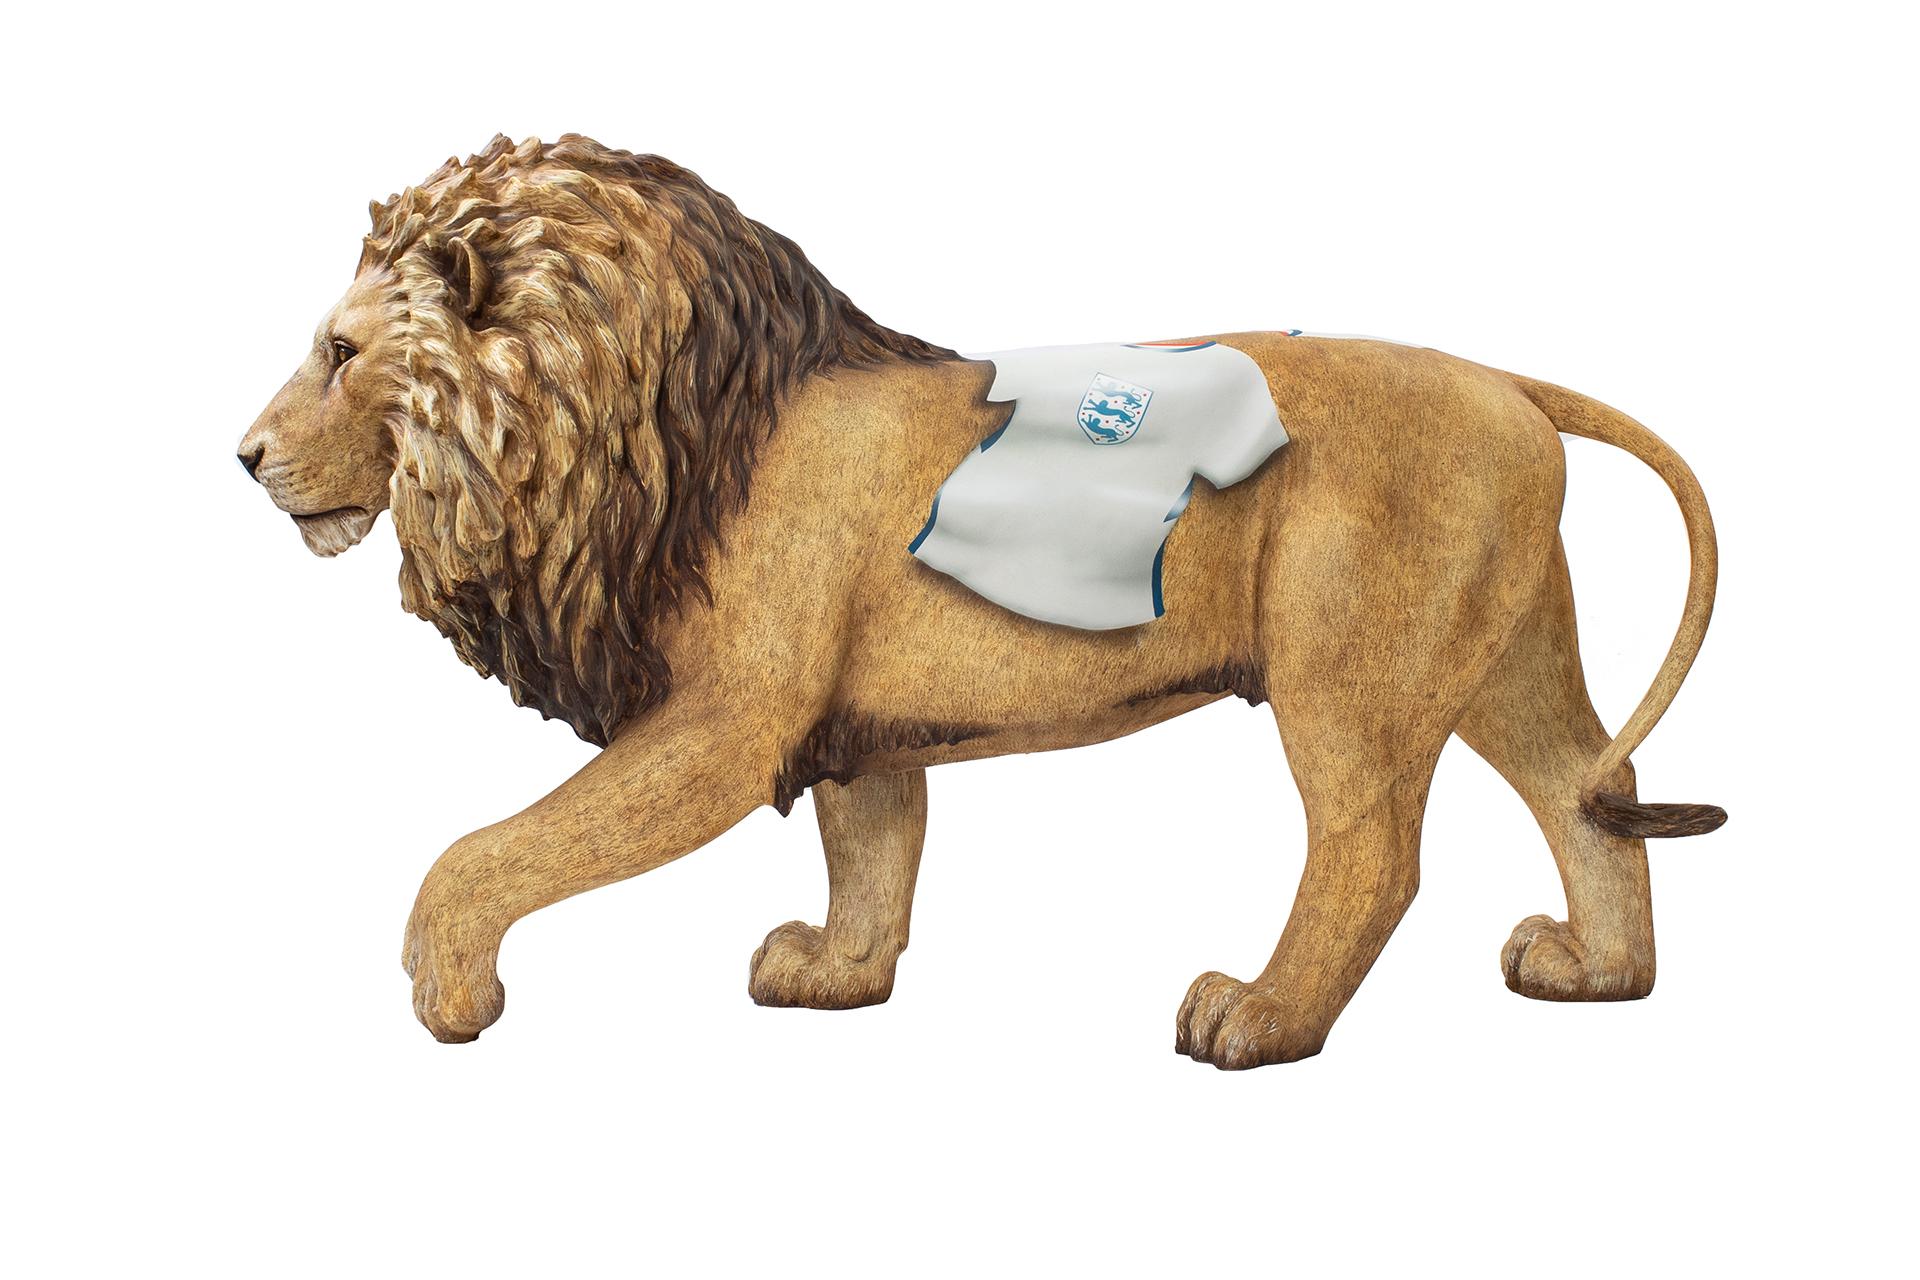 Tusk Lion Trail 2021 - Lee Mack - Generously sponsored by Deutsche Bank Image Credit: Nick Andrews